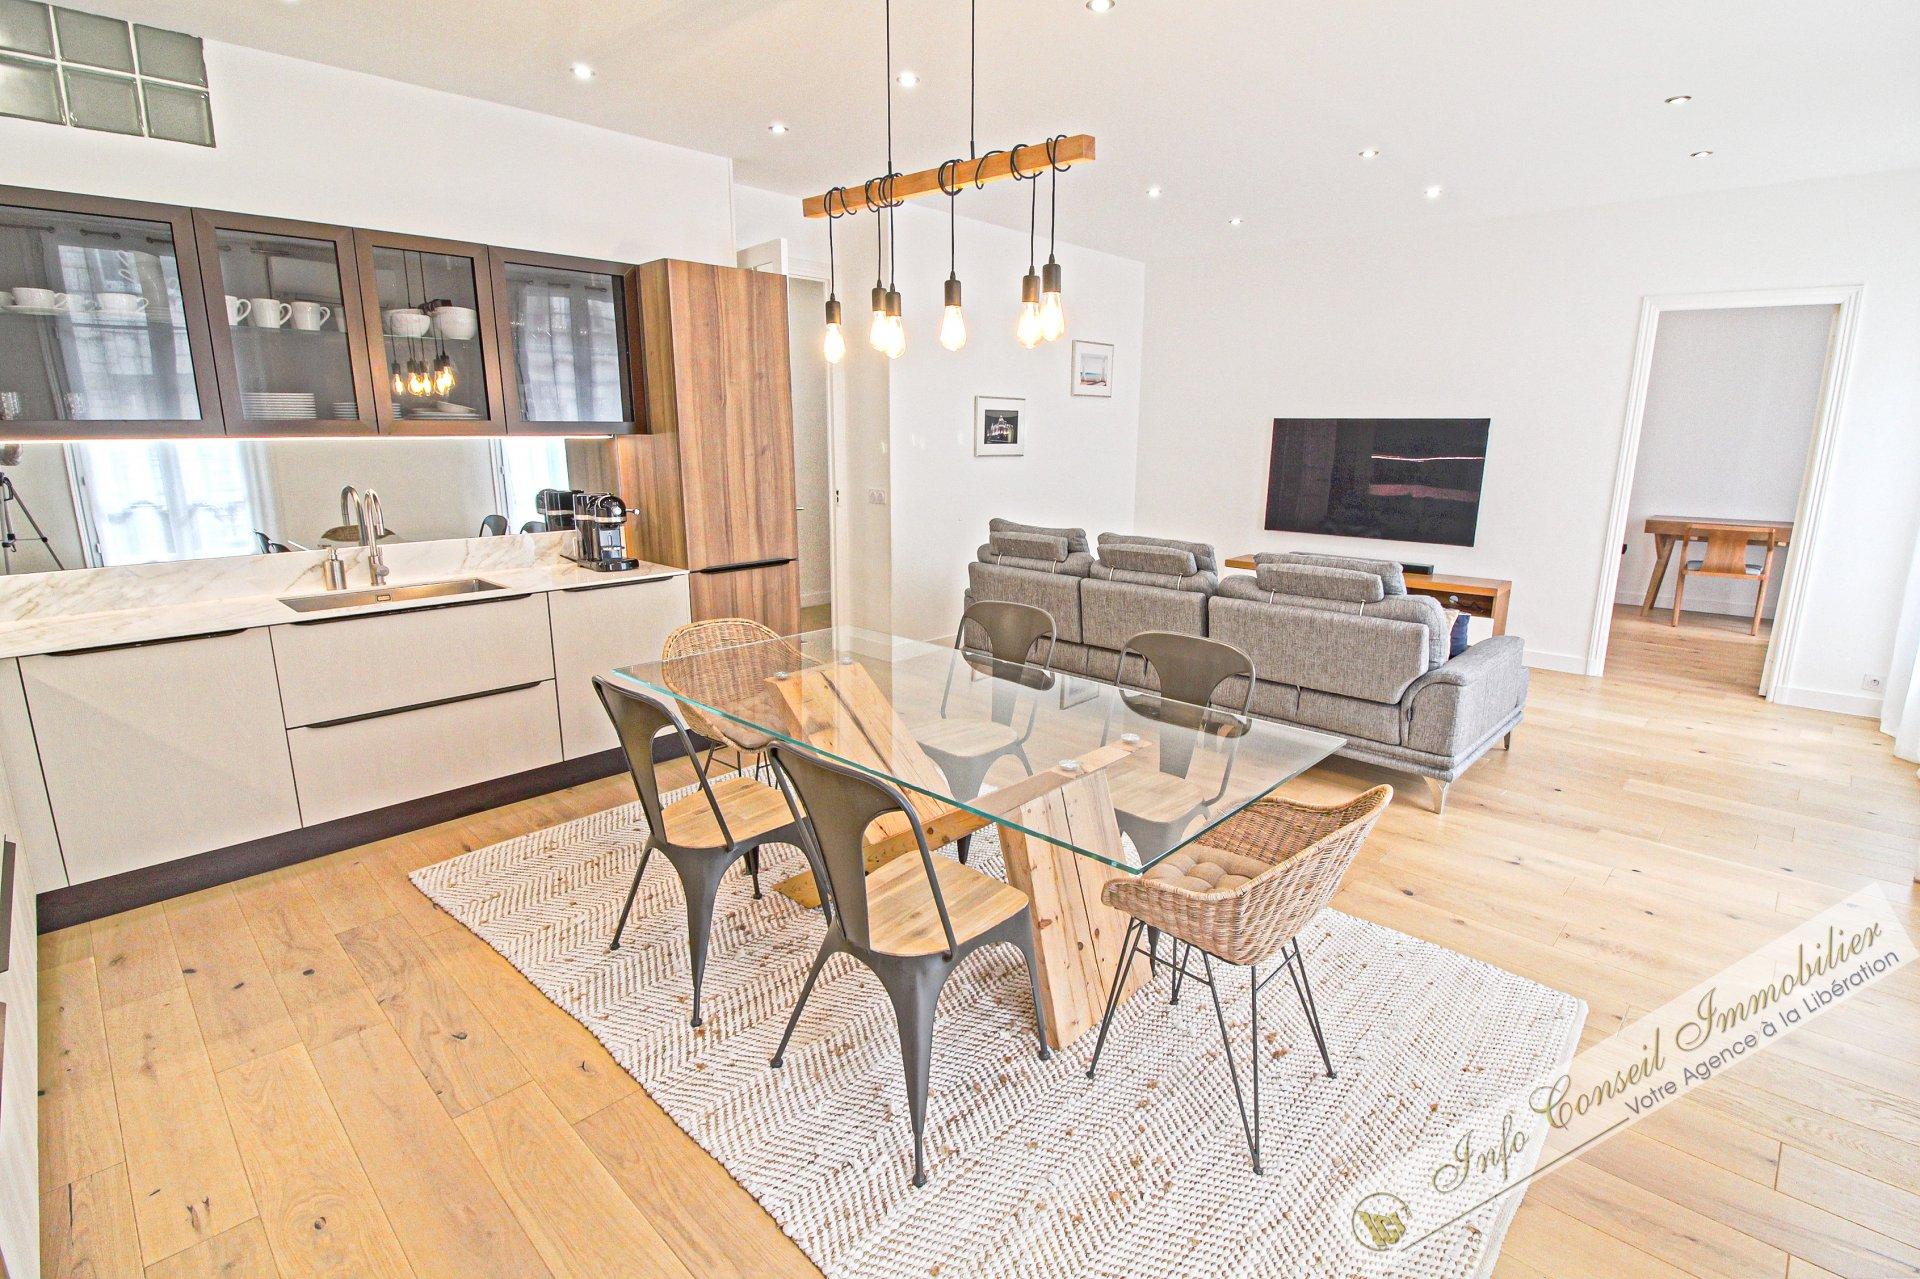 LIBERATION - Bourgeois - Splendide 4P 100 m² - refait neuf ! - cave - 479.000 €